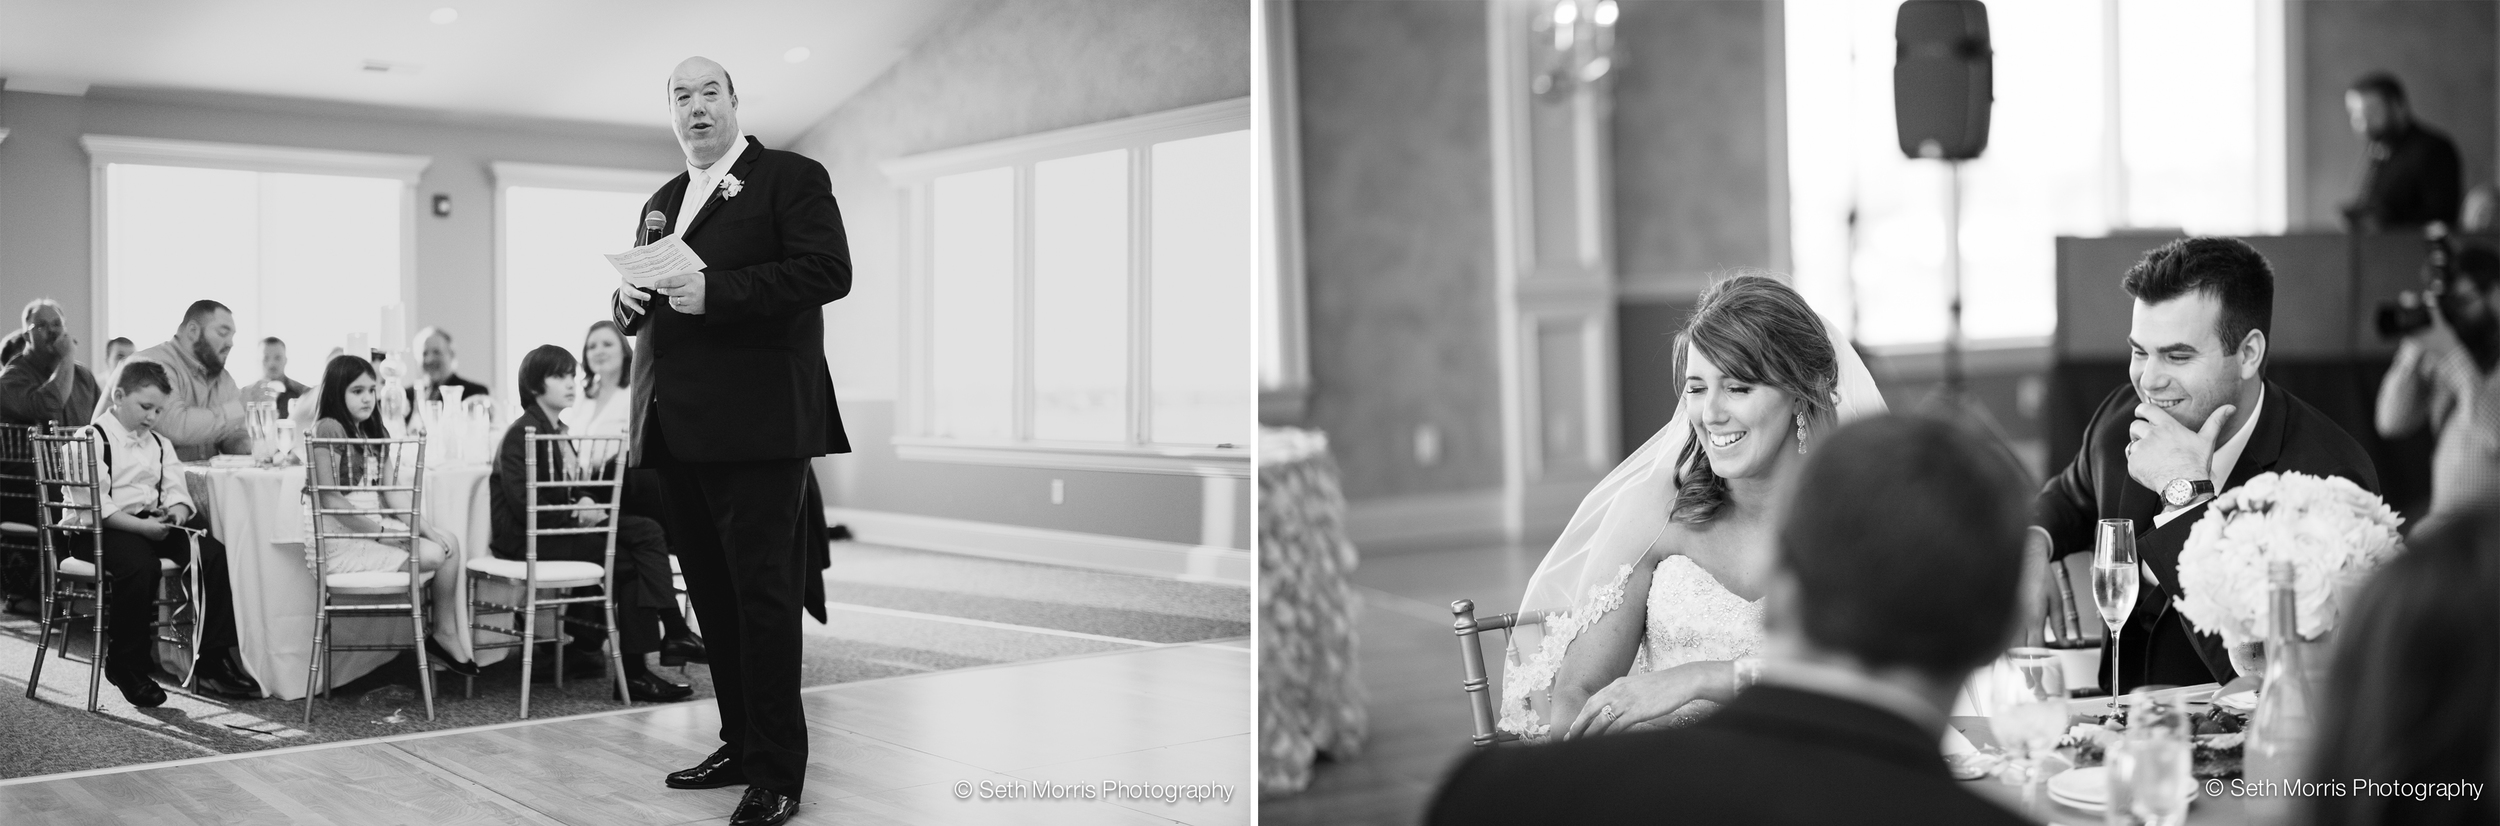 metamora-fields-wedding-photographer-peoria-172.jpg